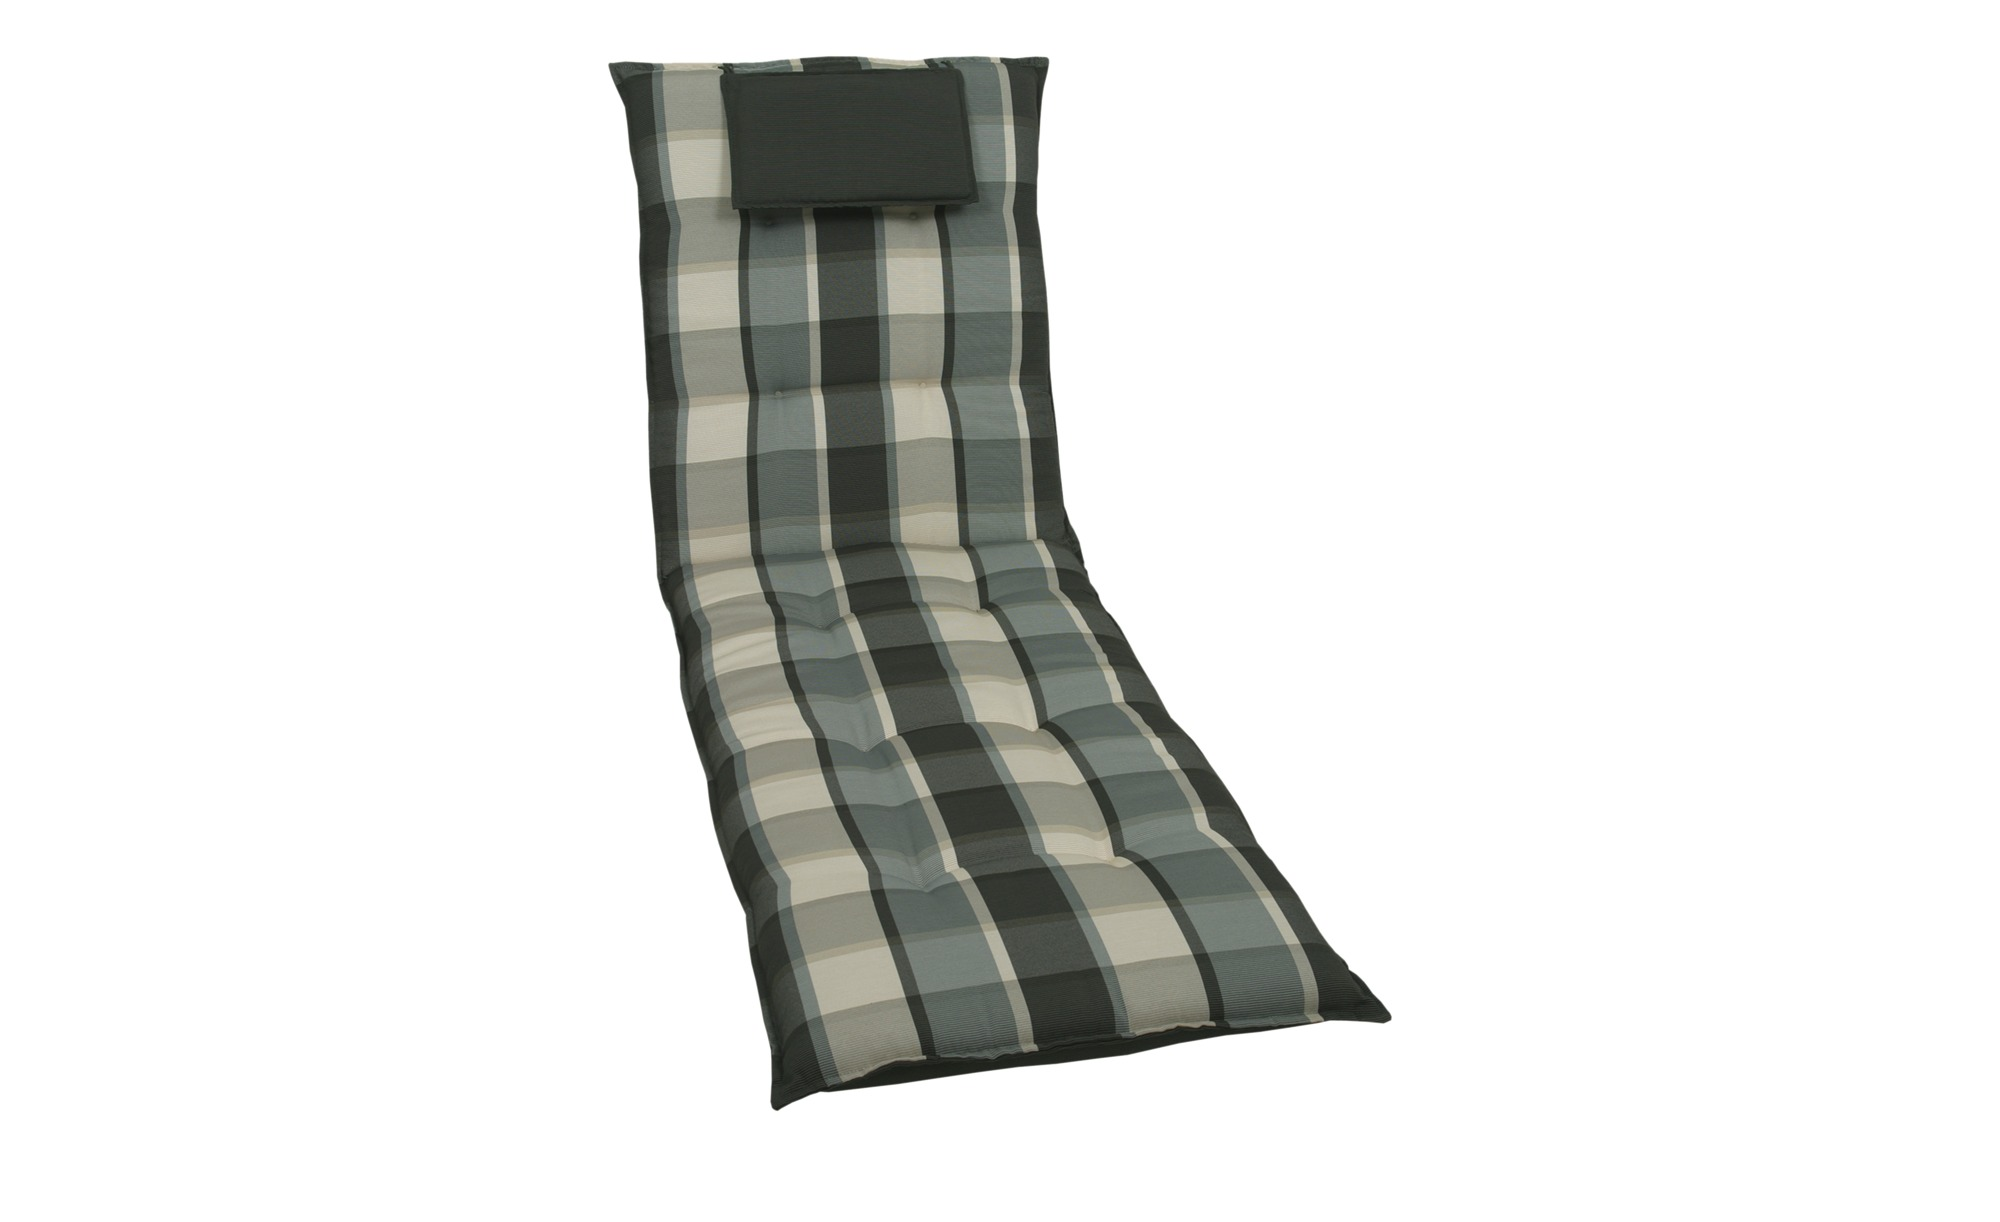 rhomtuft badteppich zebra kiesel weiss 1401 60x90 cm haehnchen karlsruhe. Black Bedroom Furniture Sets. Home Design Ideas